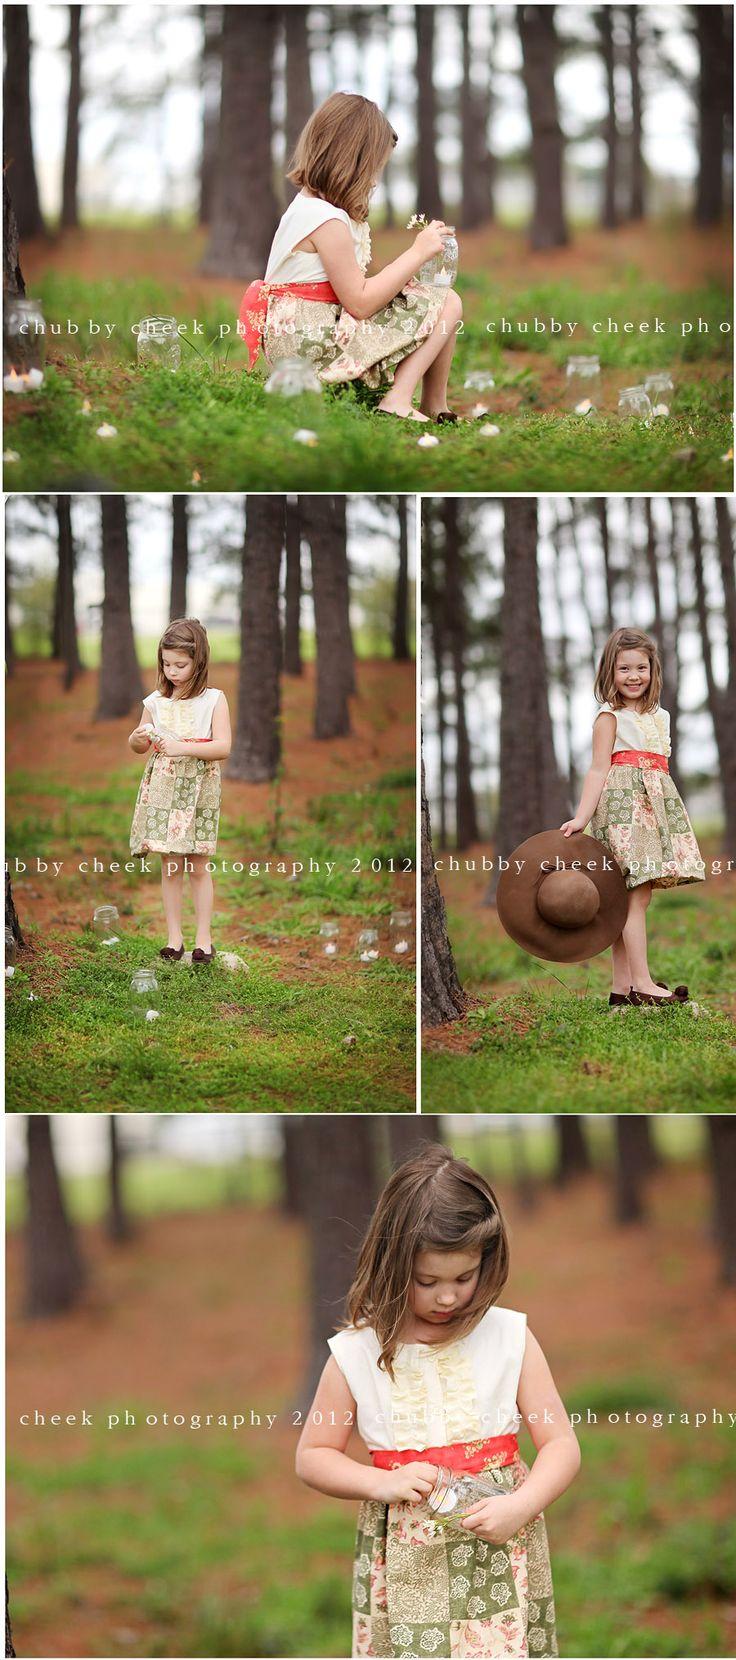 woods photo  chubby cheek photography cypress tx child photographer